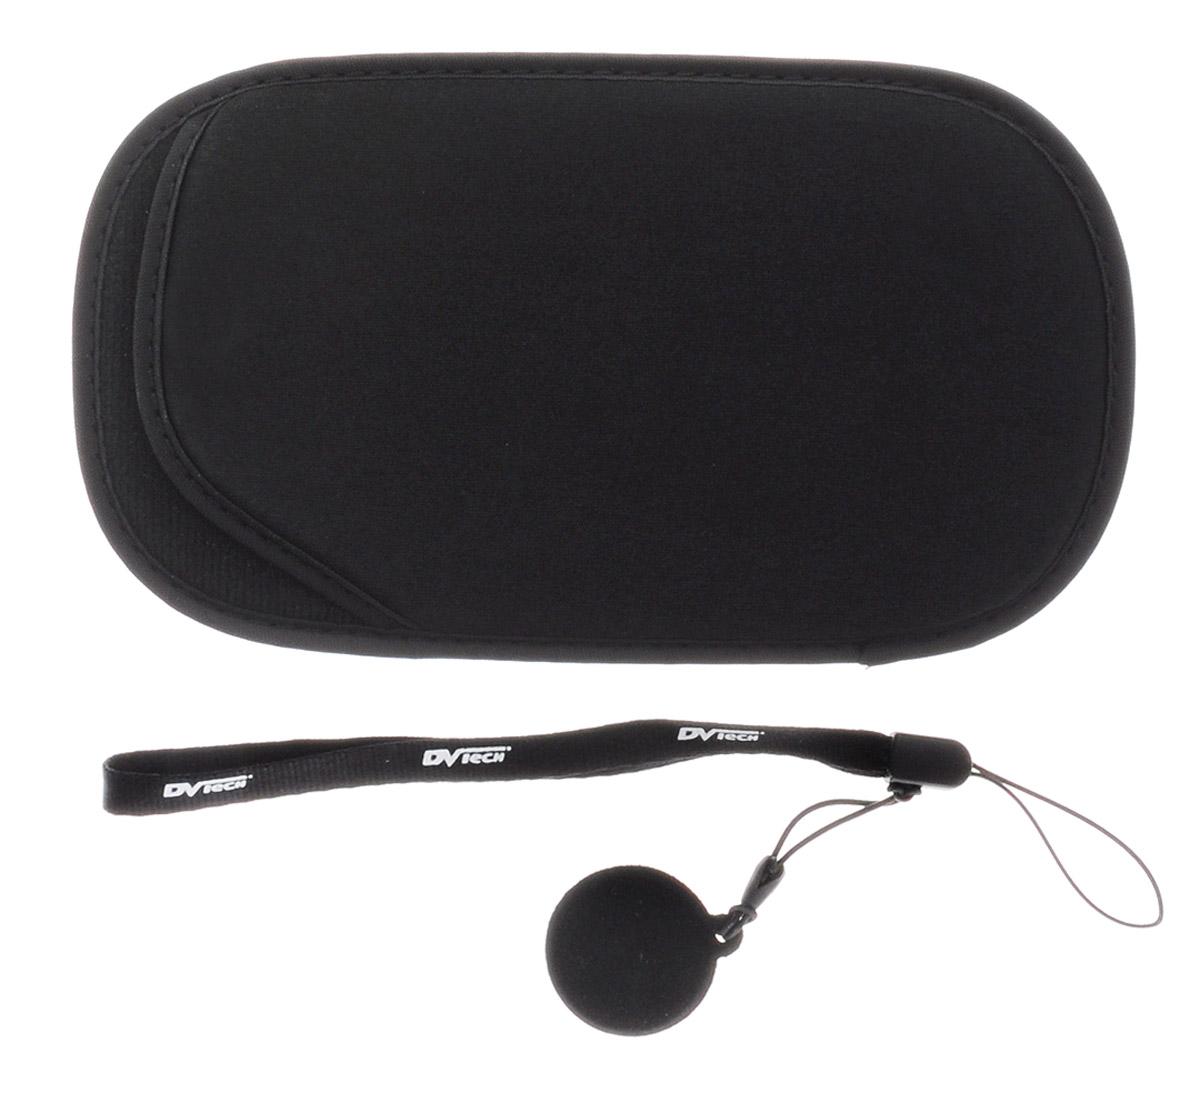 Защитный набор для консоли Sony PSP защитная пленка для экрана sony psp